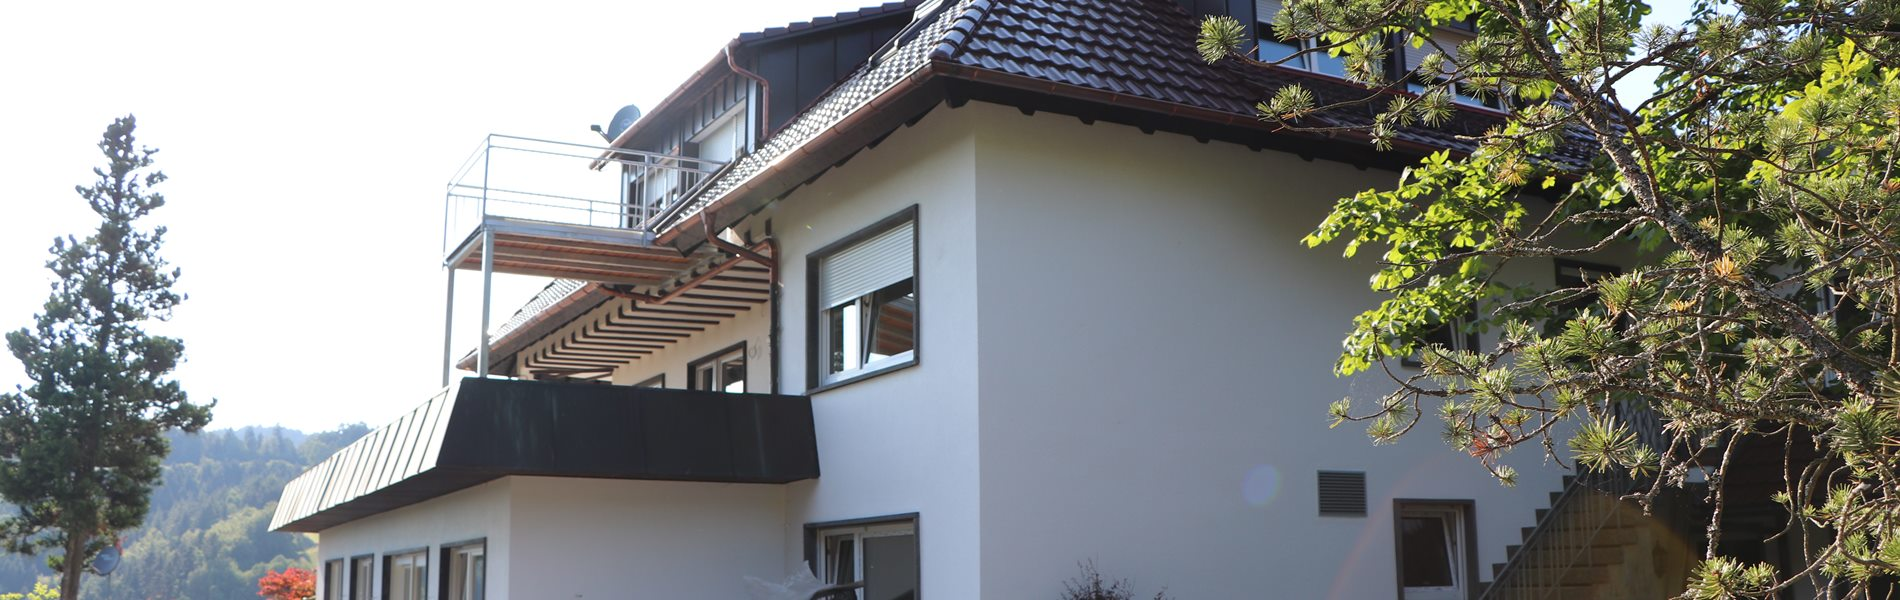 wohnung-acht-sommer-oberharmersbach